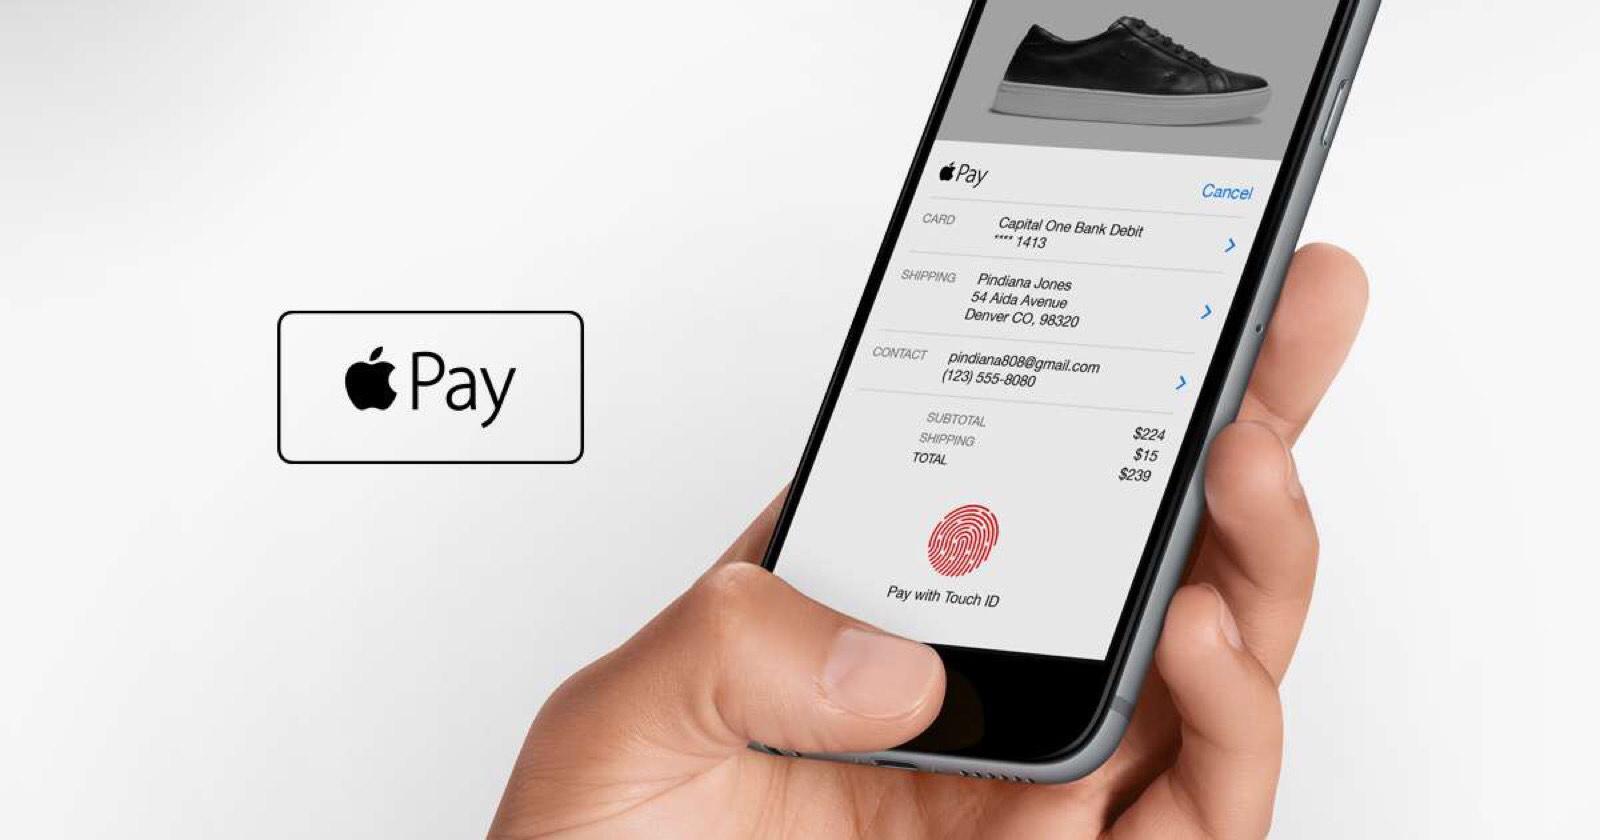 Western Union has Apple Pay cash transfers